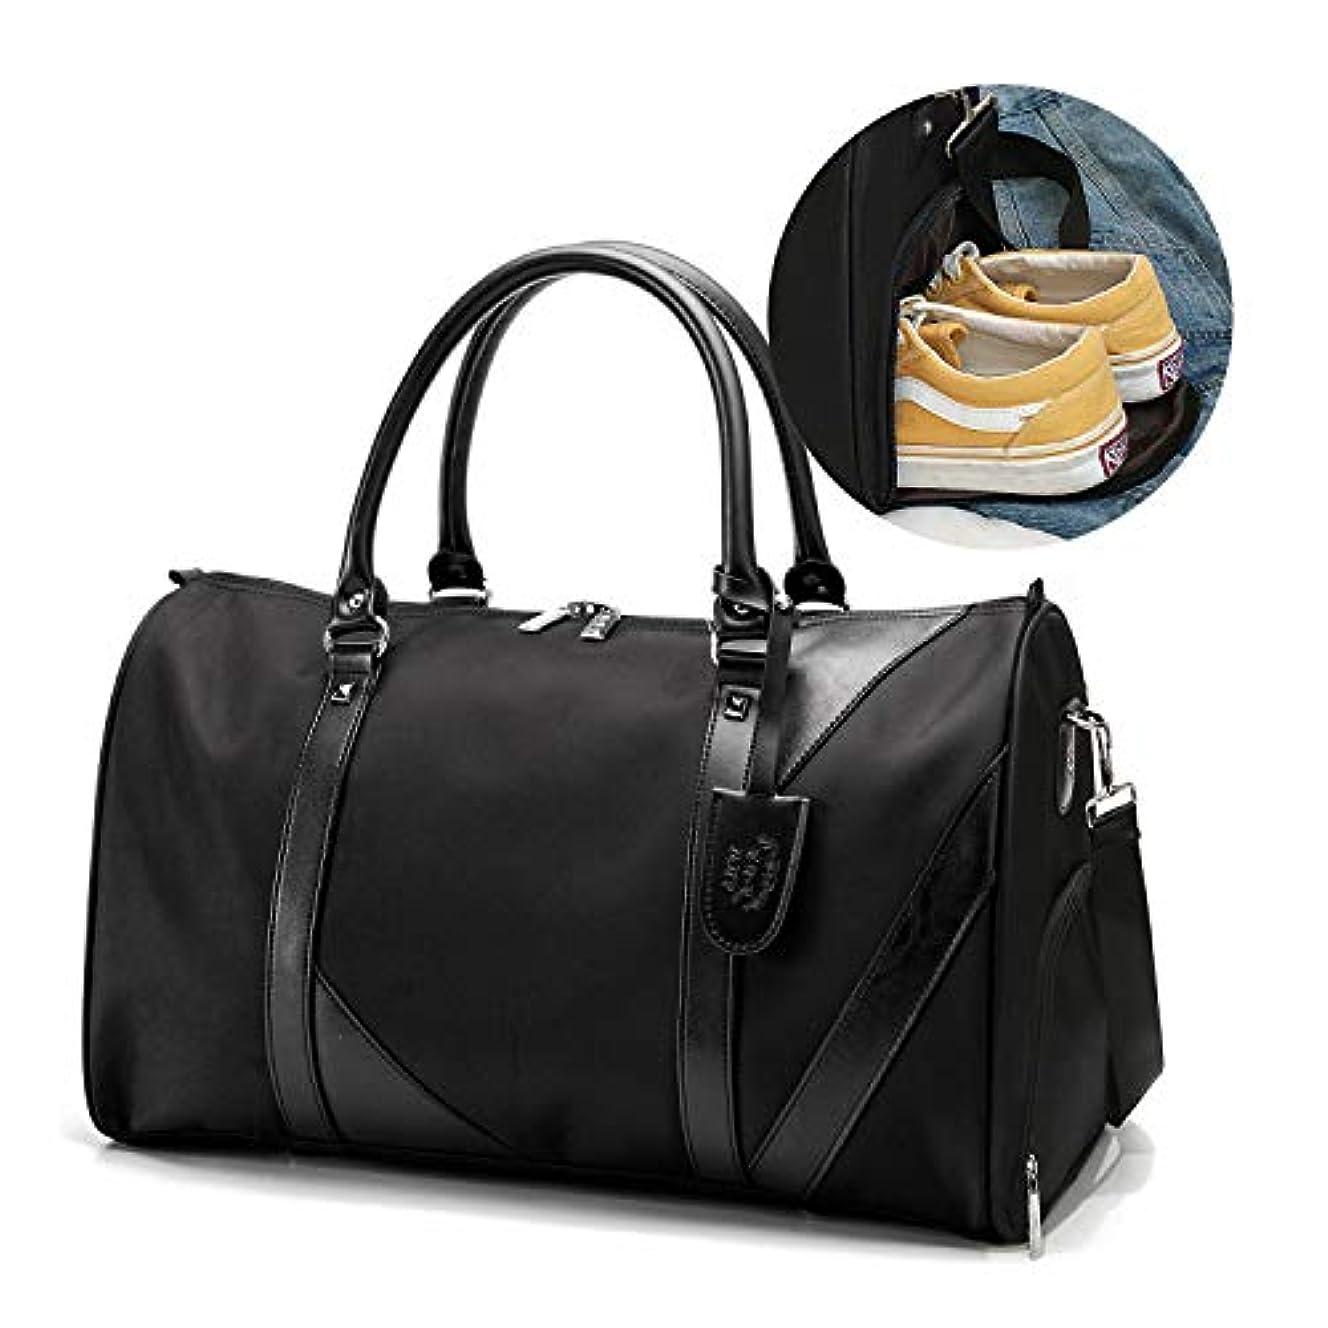 [TcIFE]ボストンバッグ レディース メンズ スポーツダッフルバッグ ガーメントバッグ 大容量 修学 旅行トラベルバッグ シューズ収納バッグ